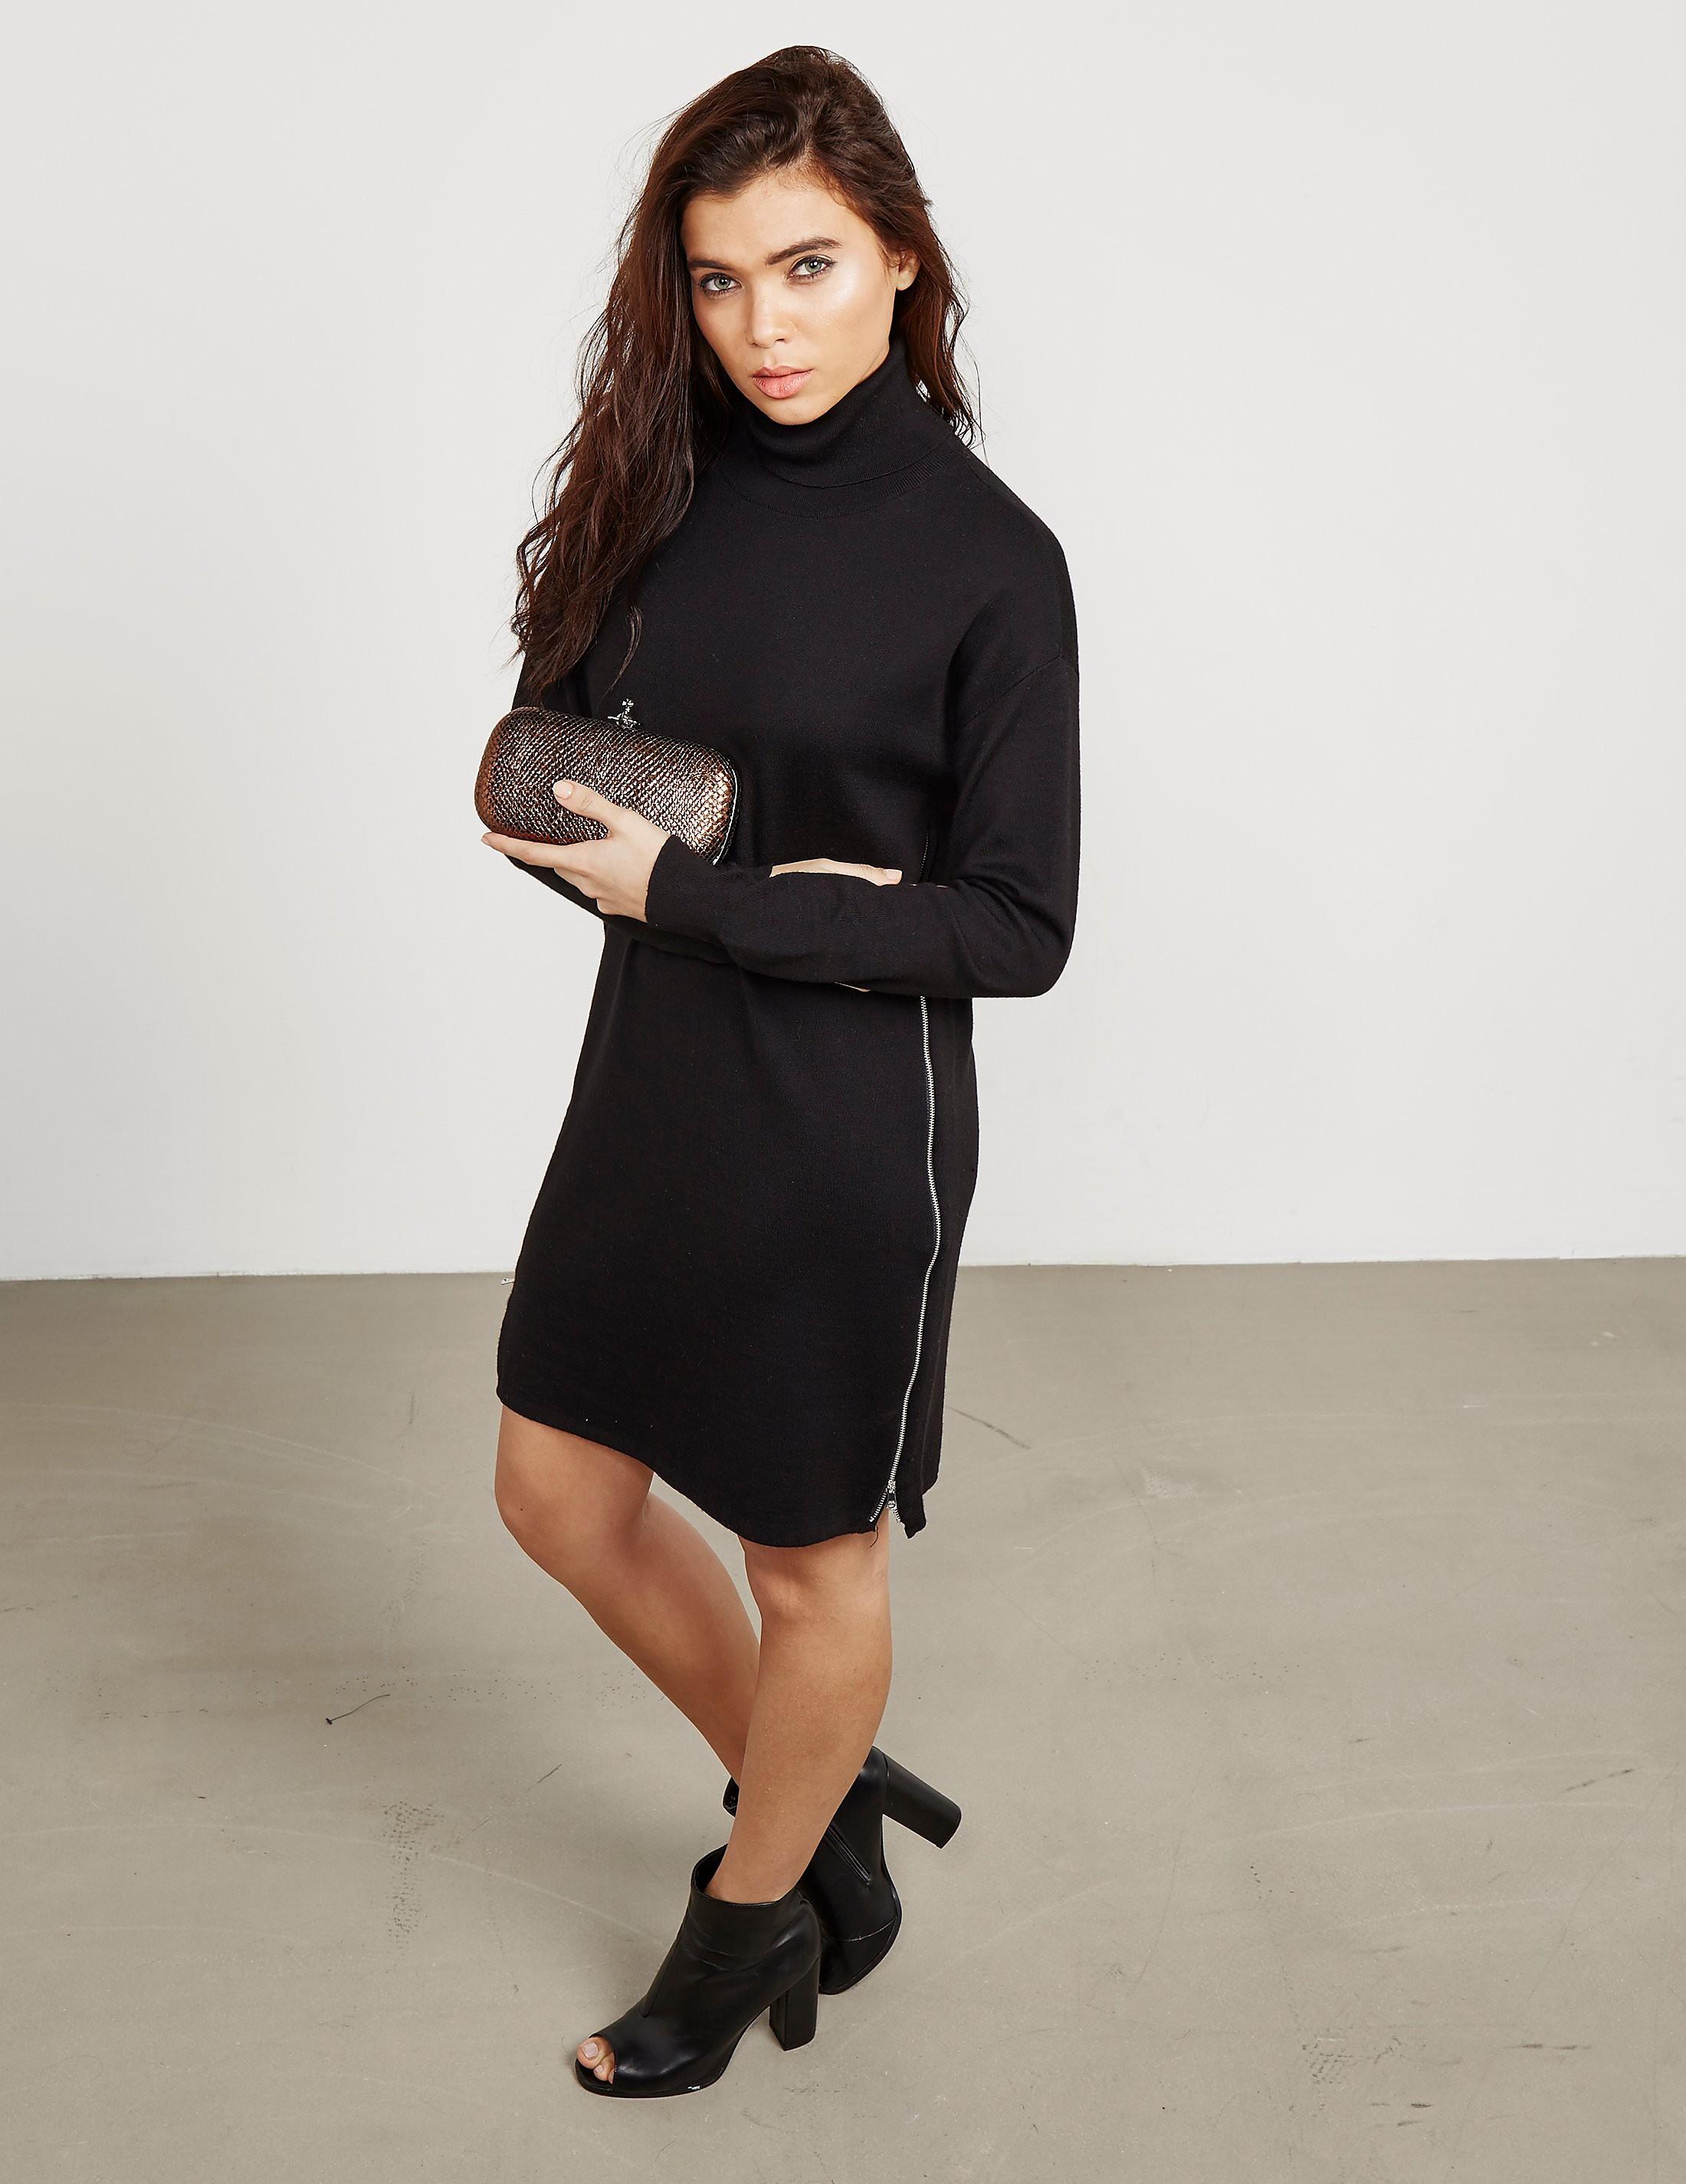 Vivienne Westwood Verona Clutch Bag - Online Exclusive